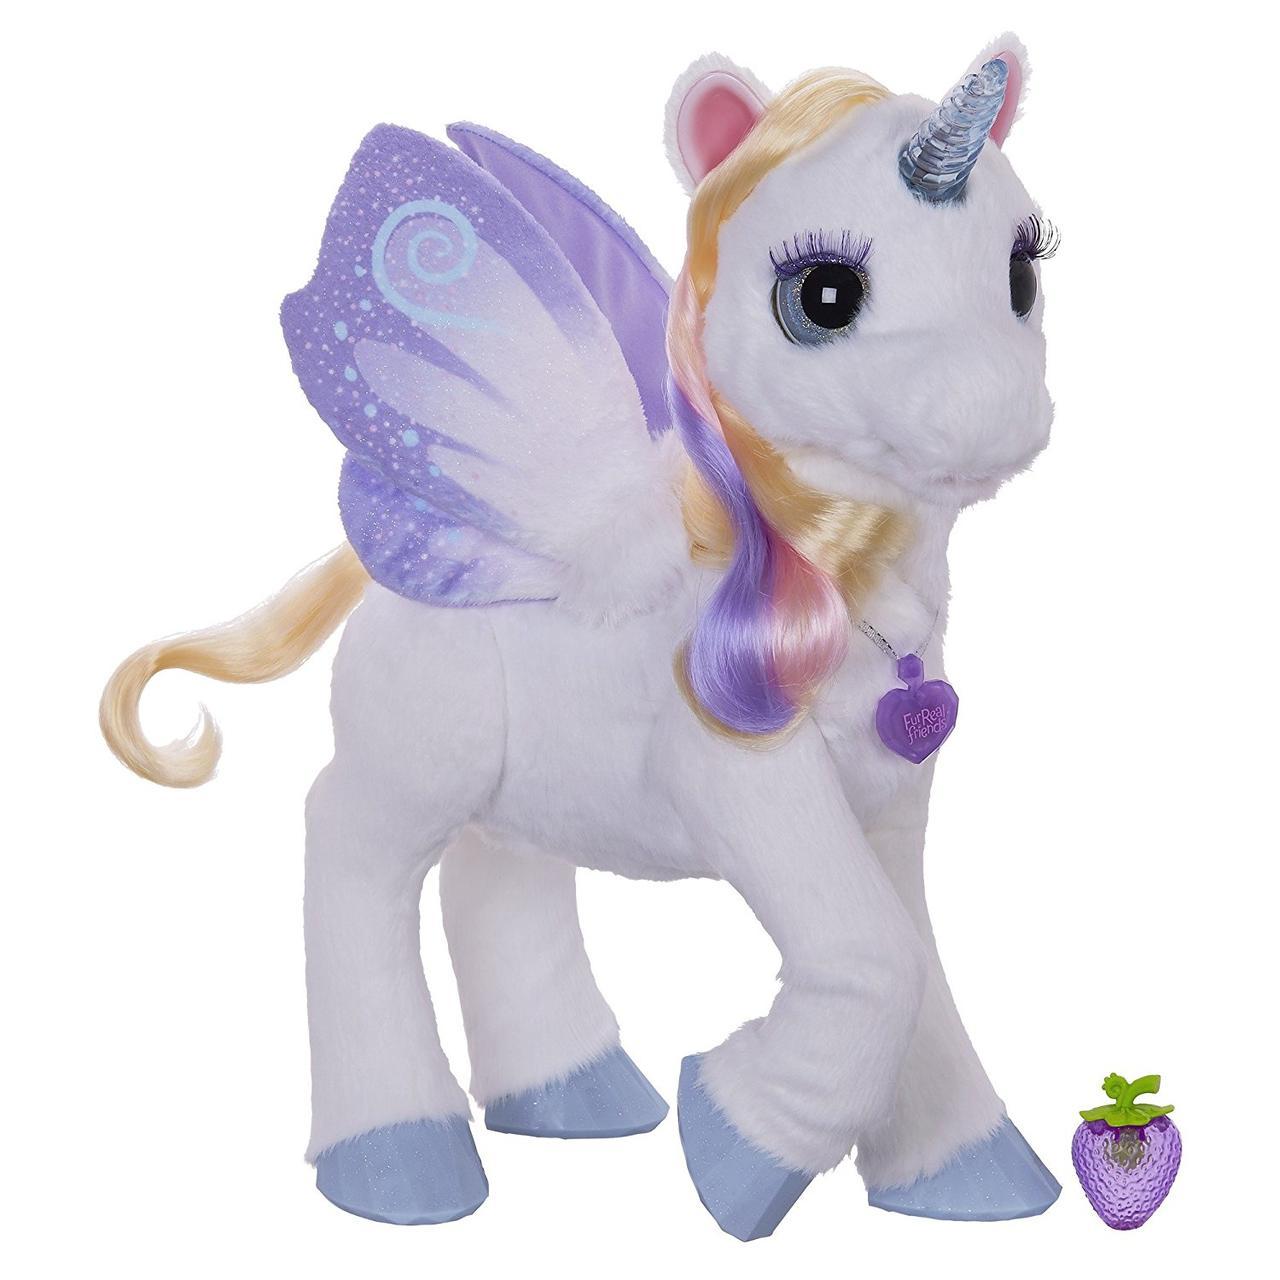 Интерактивный единорог Звезда Лили FurReal Friends StarLily, My Magical Unicorn